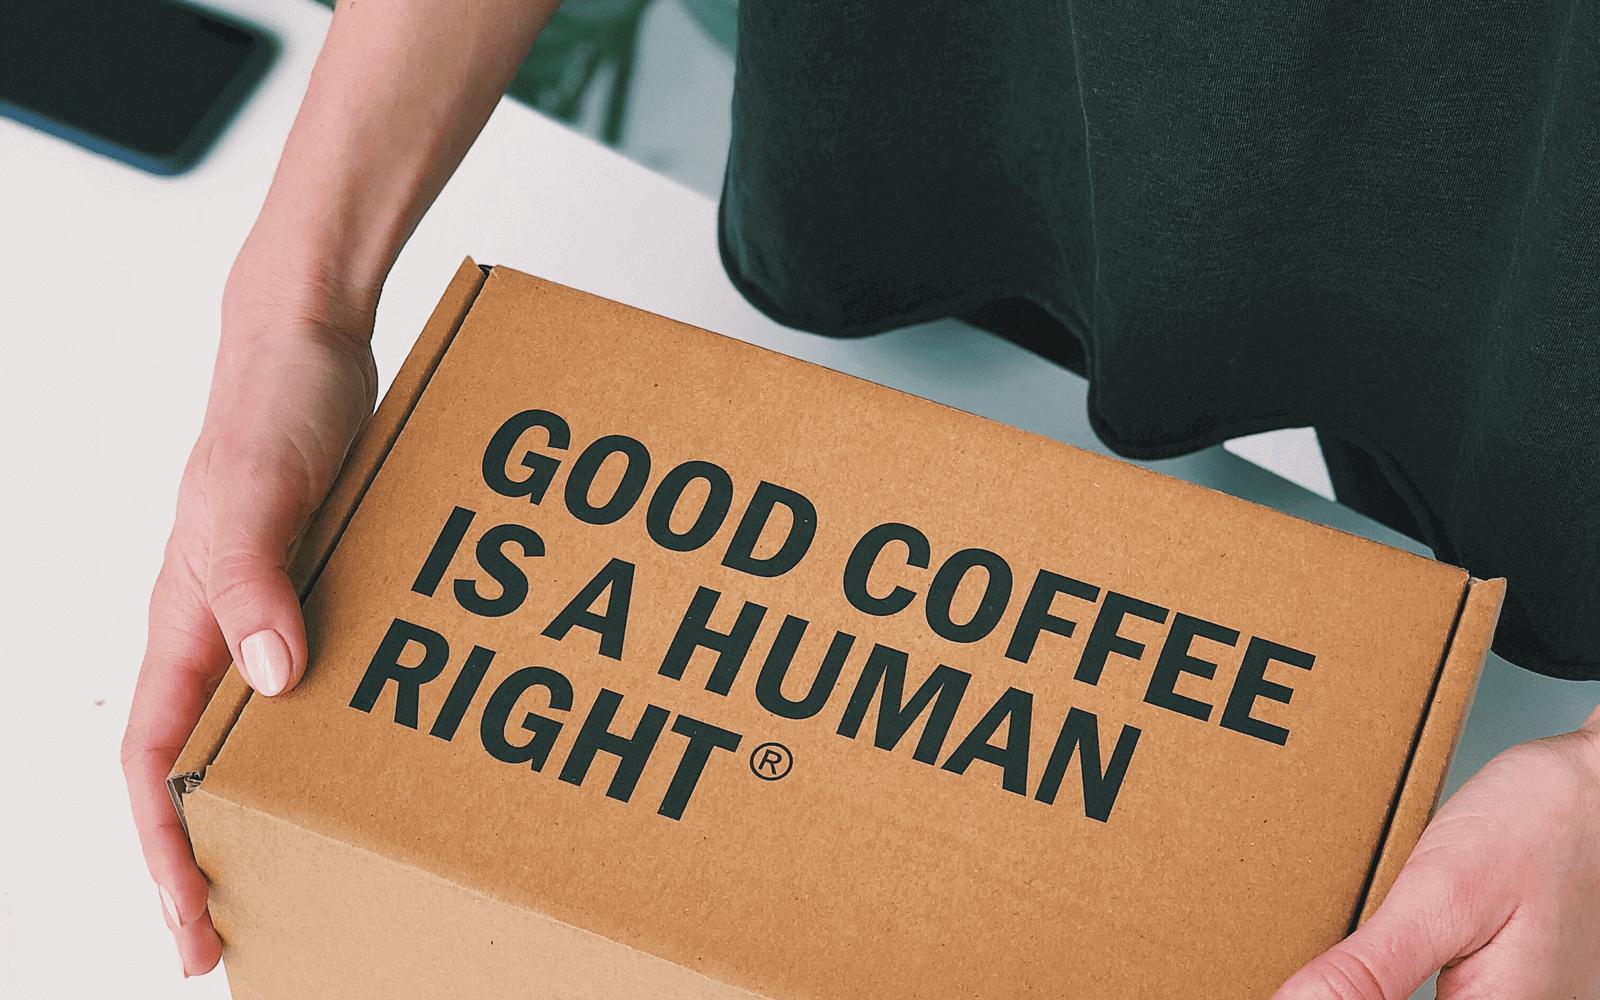 obalky good coffee packhelp